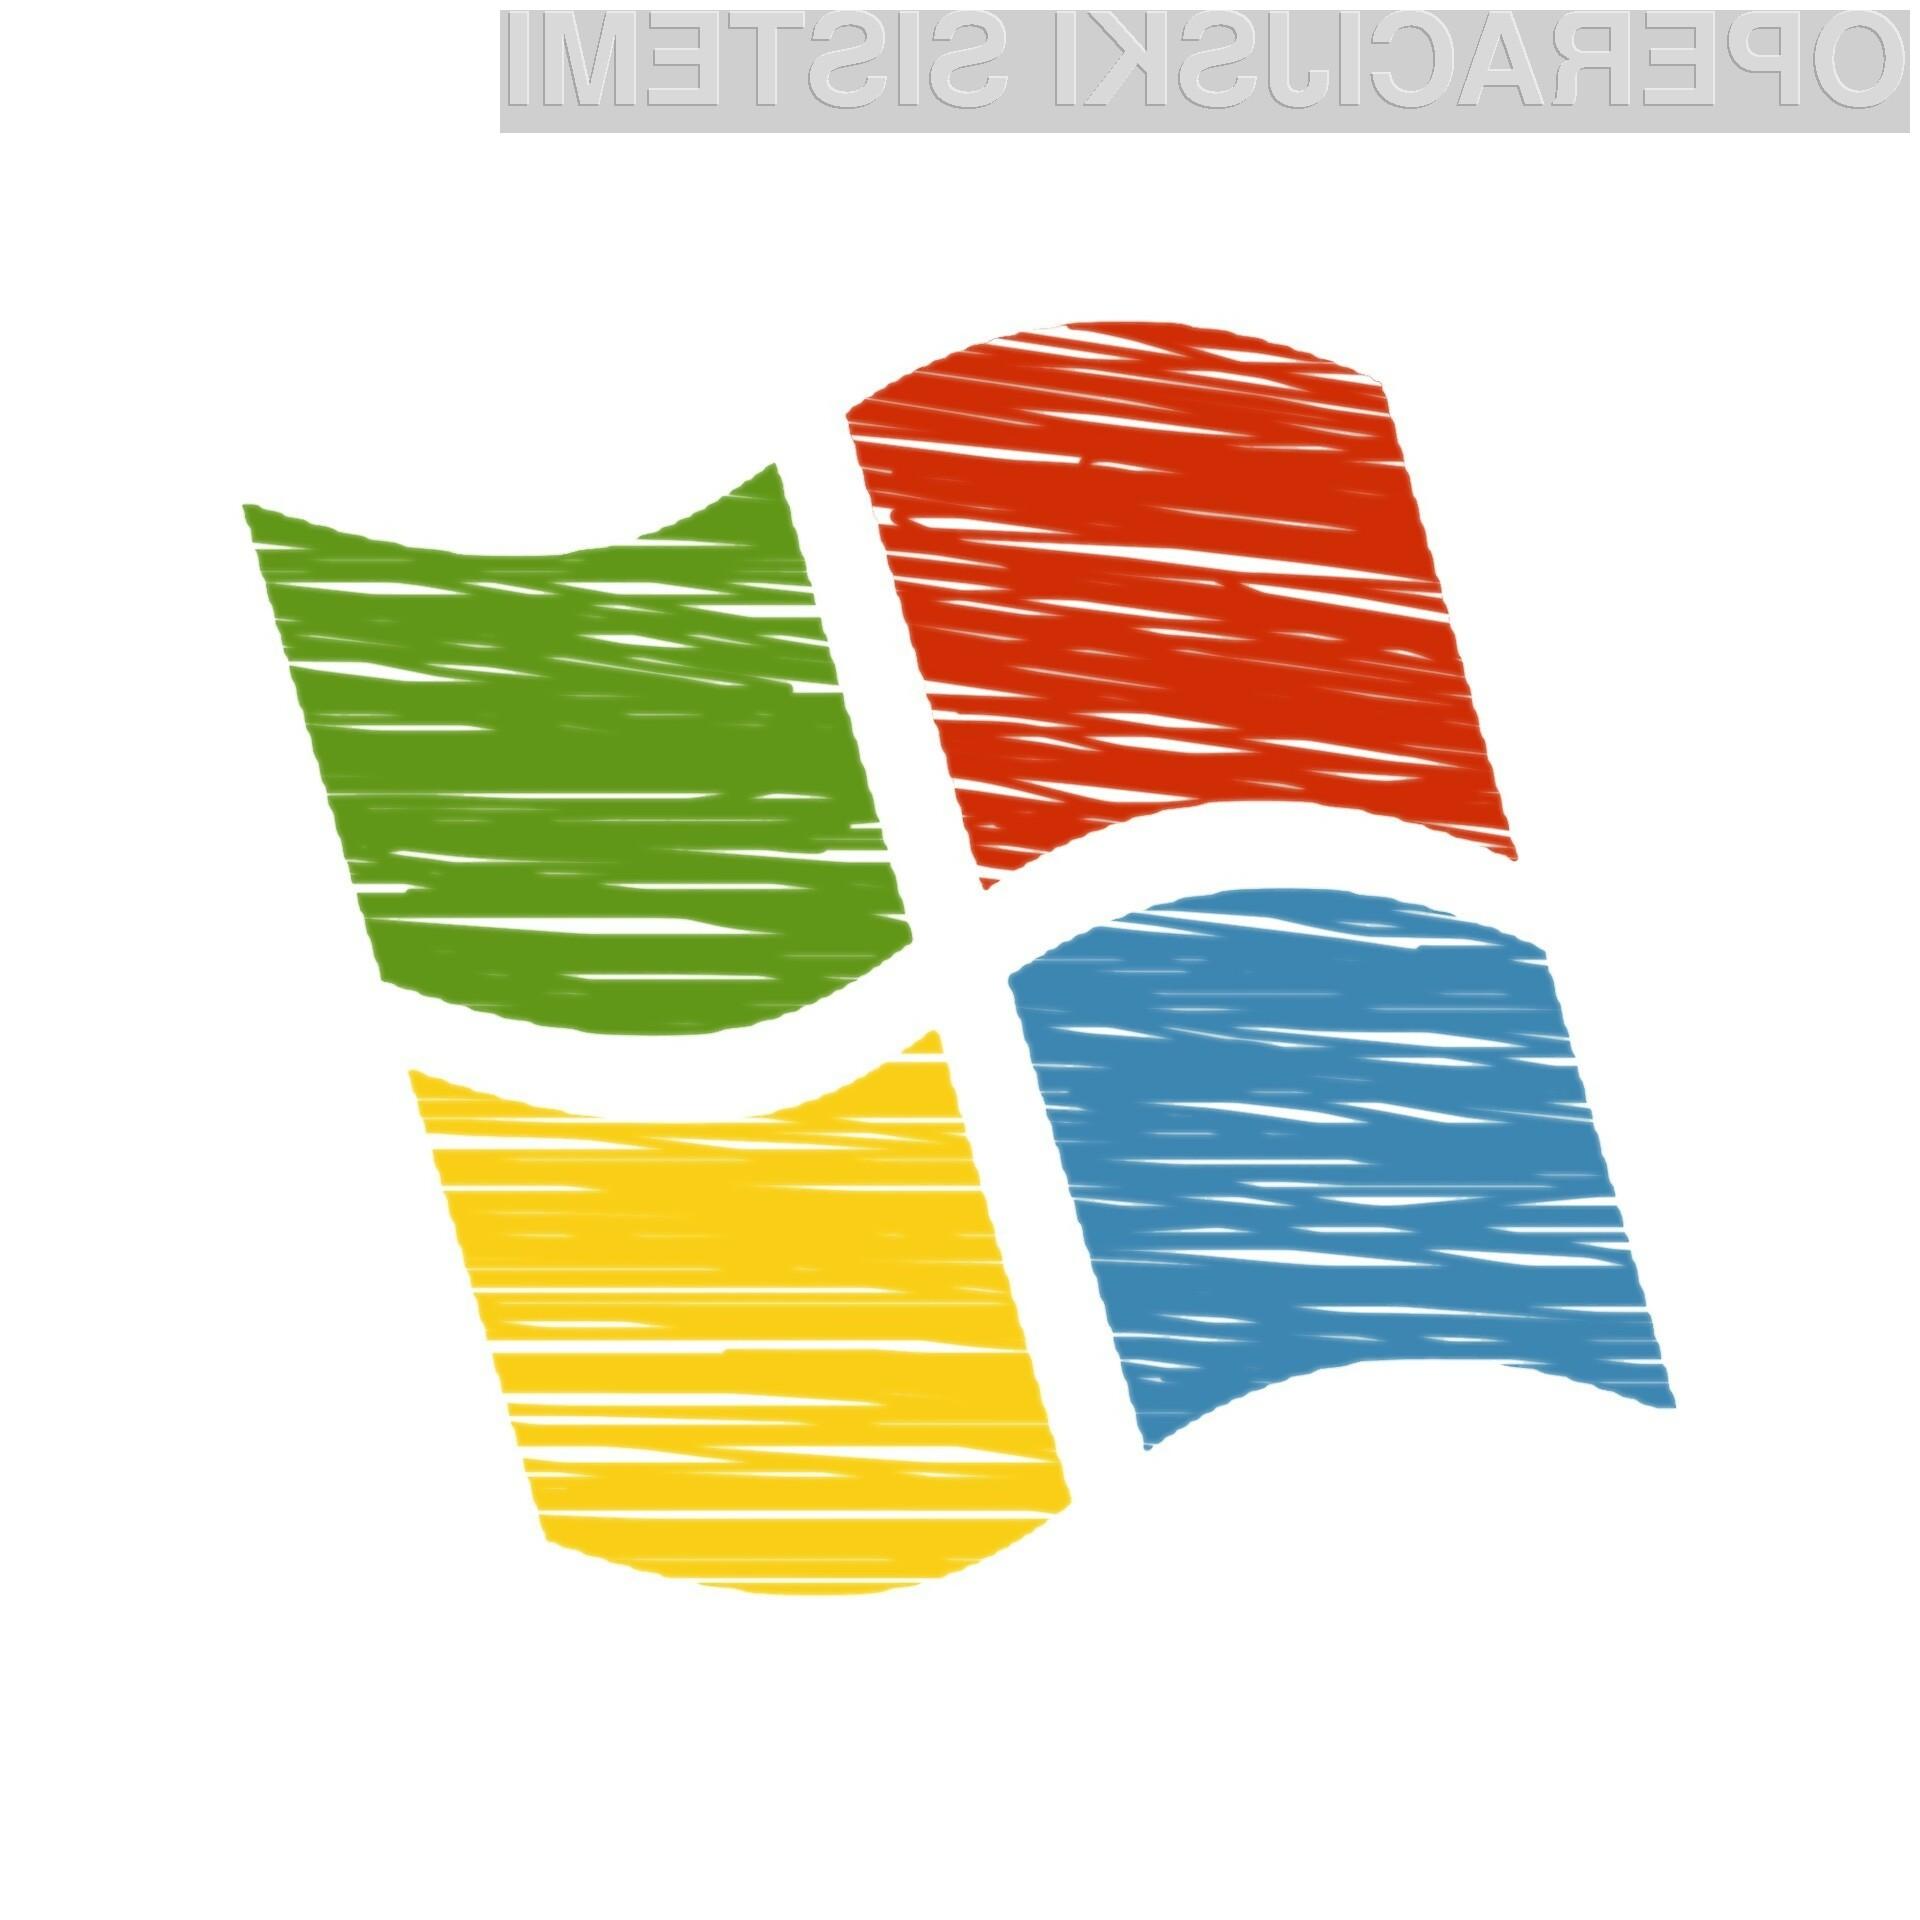 icon-1971135_1920.jpg